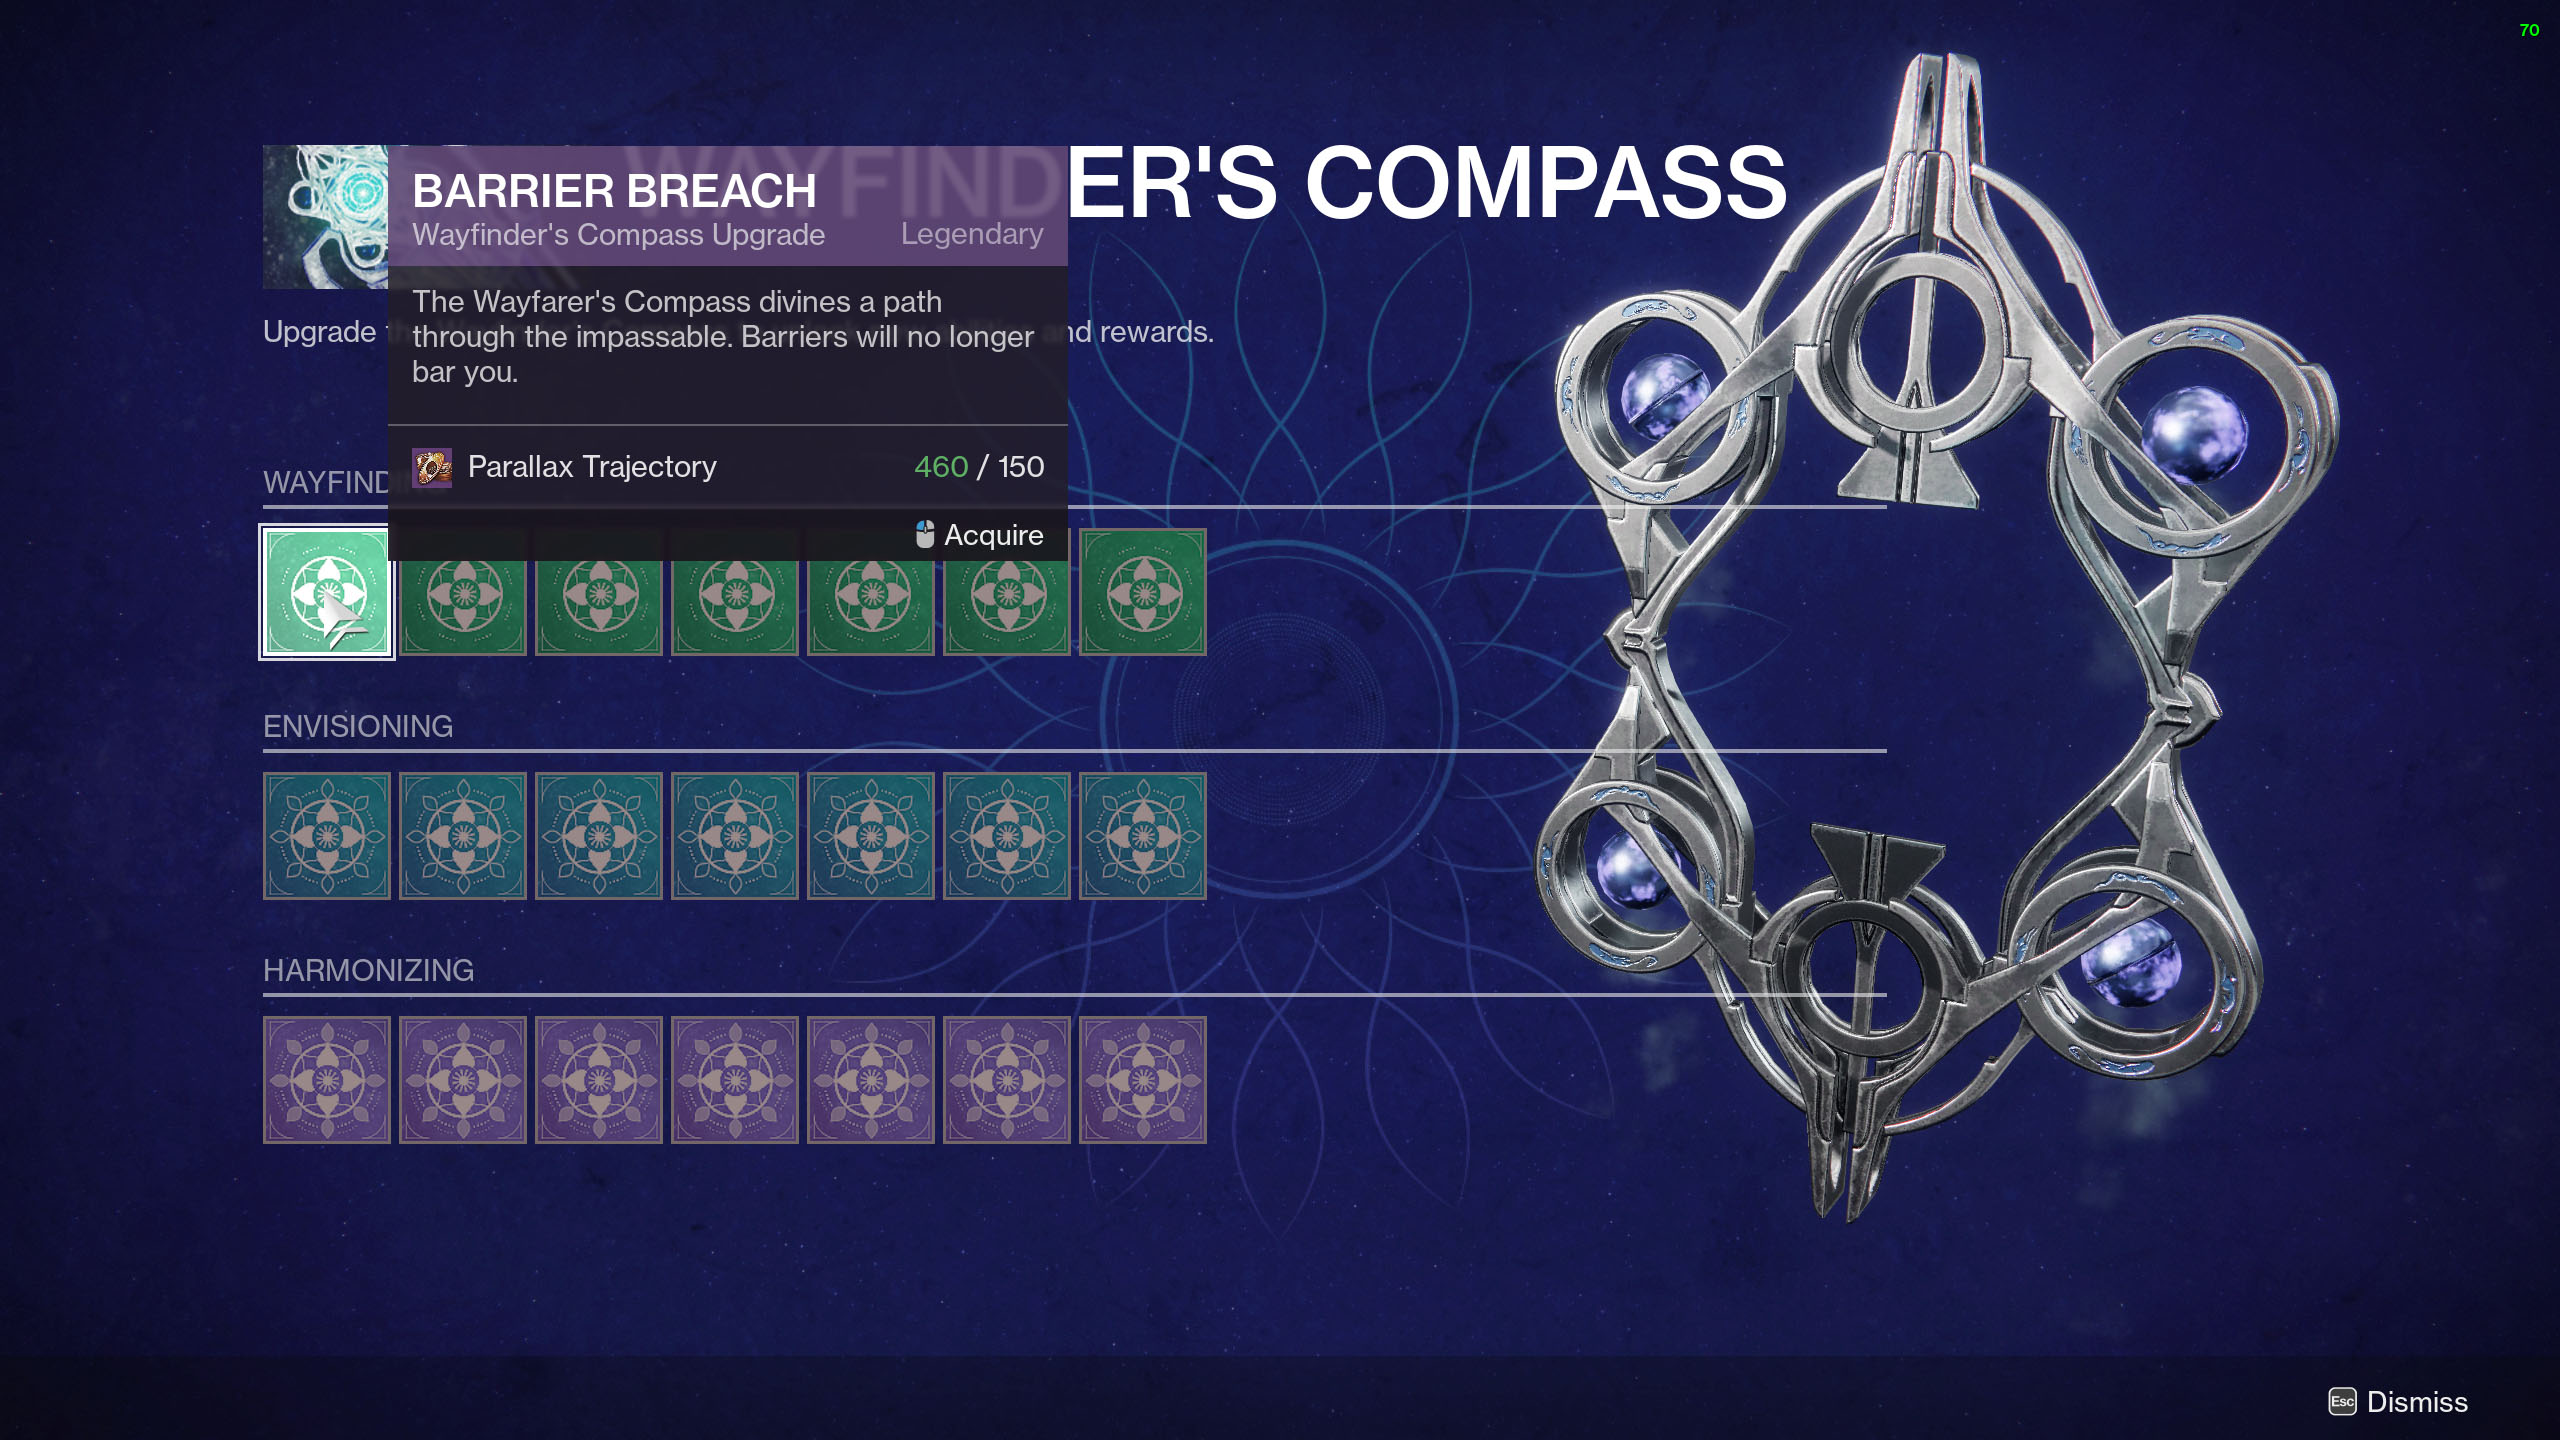 destiny 2 season of the lost campaign wayfinders compass upgrade